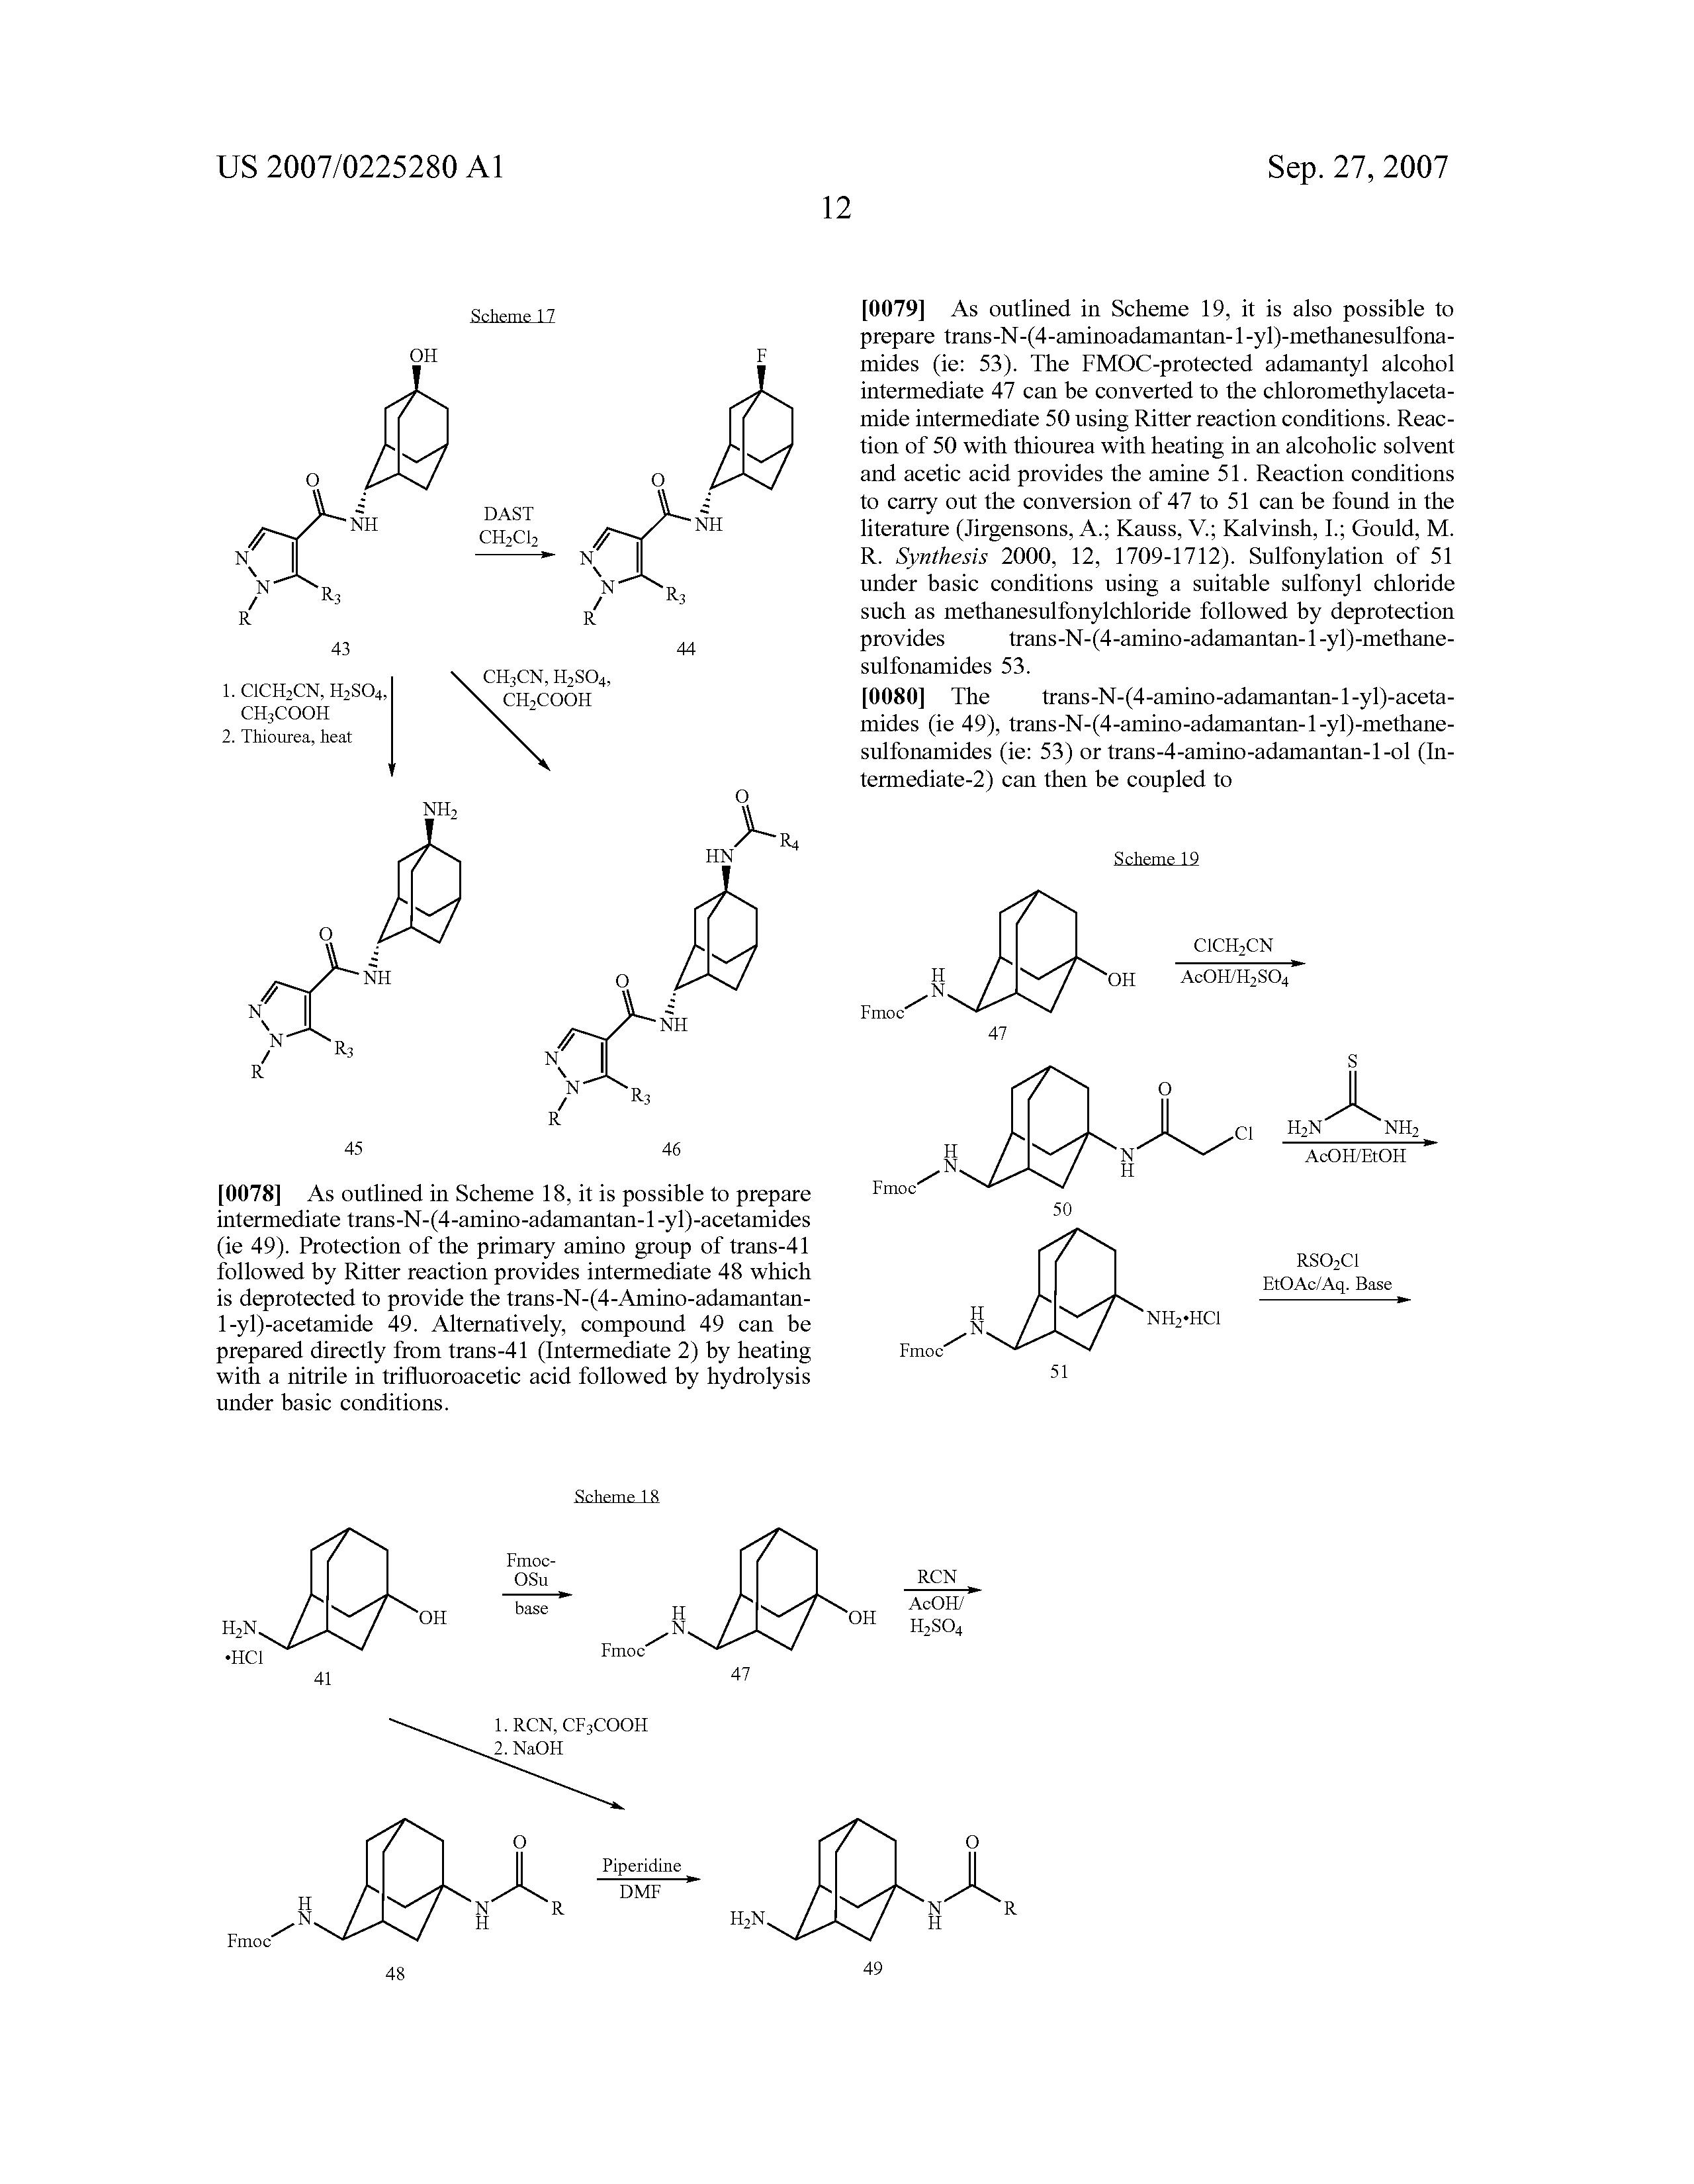 11b hydroxysteroid